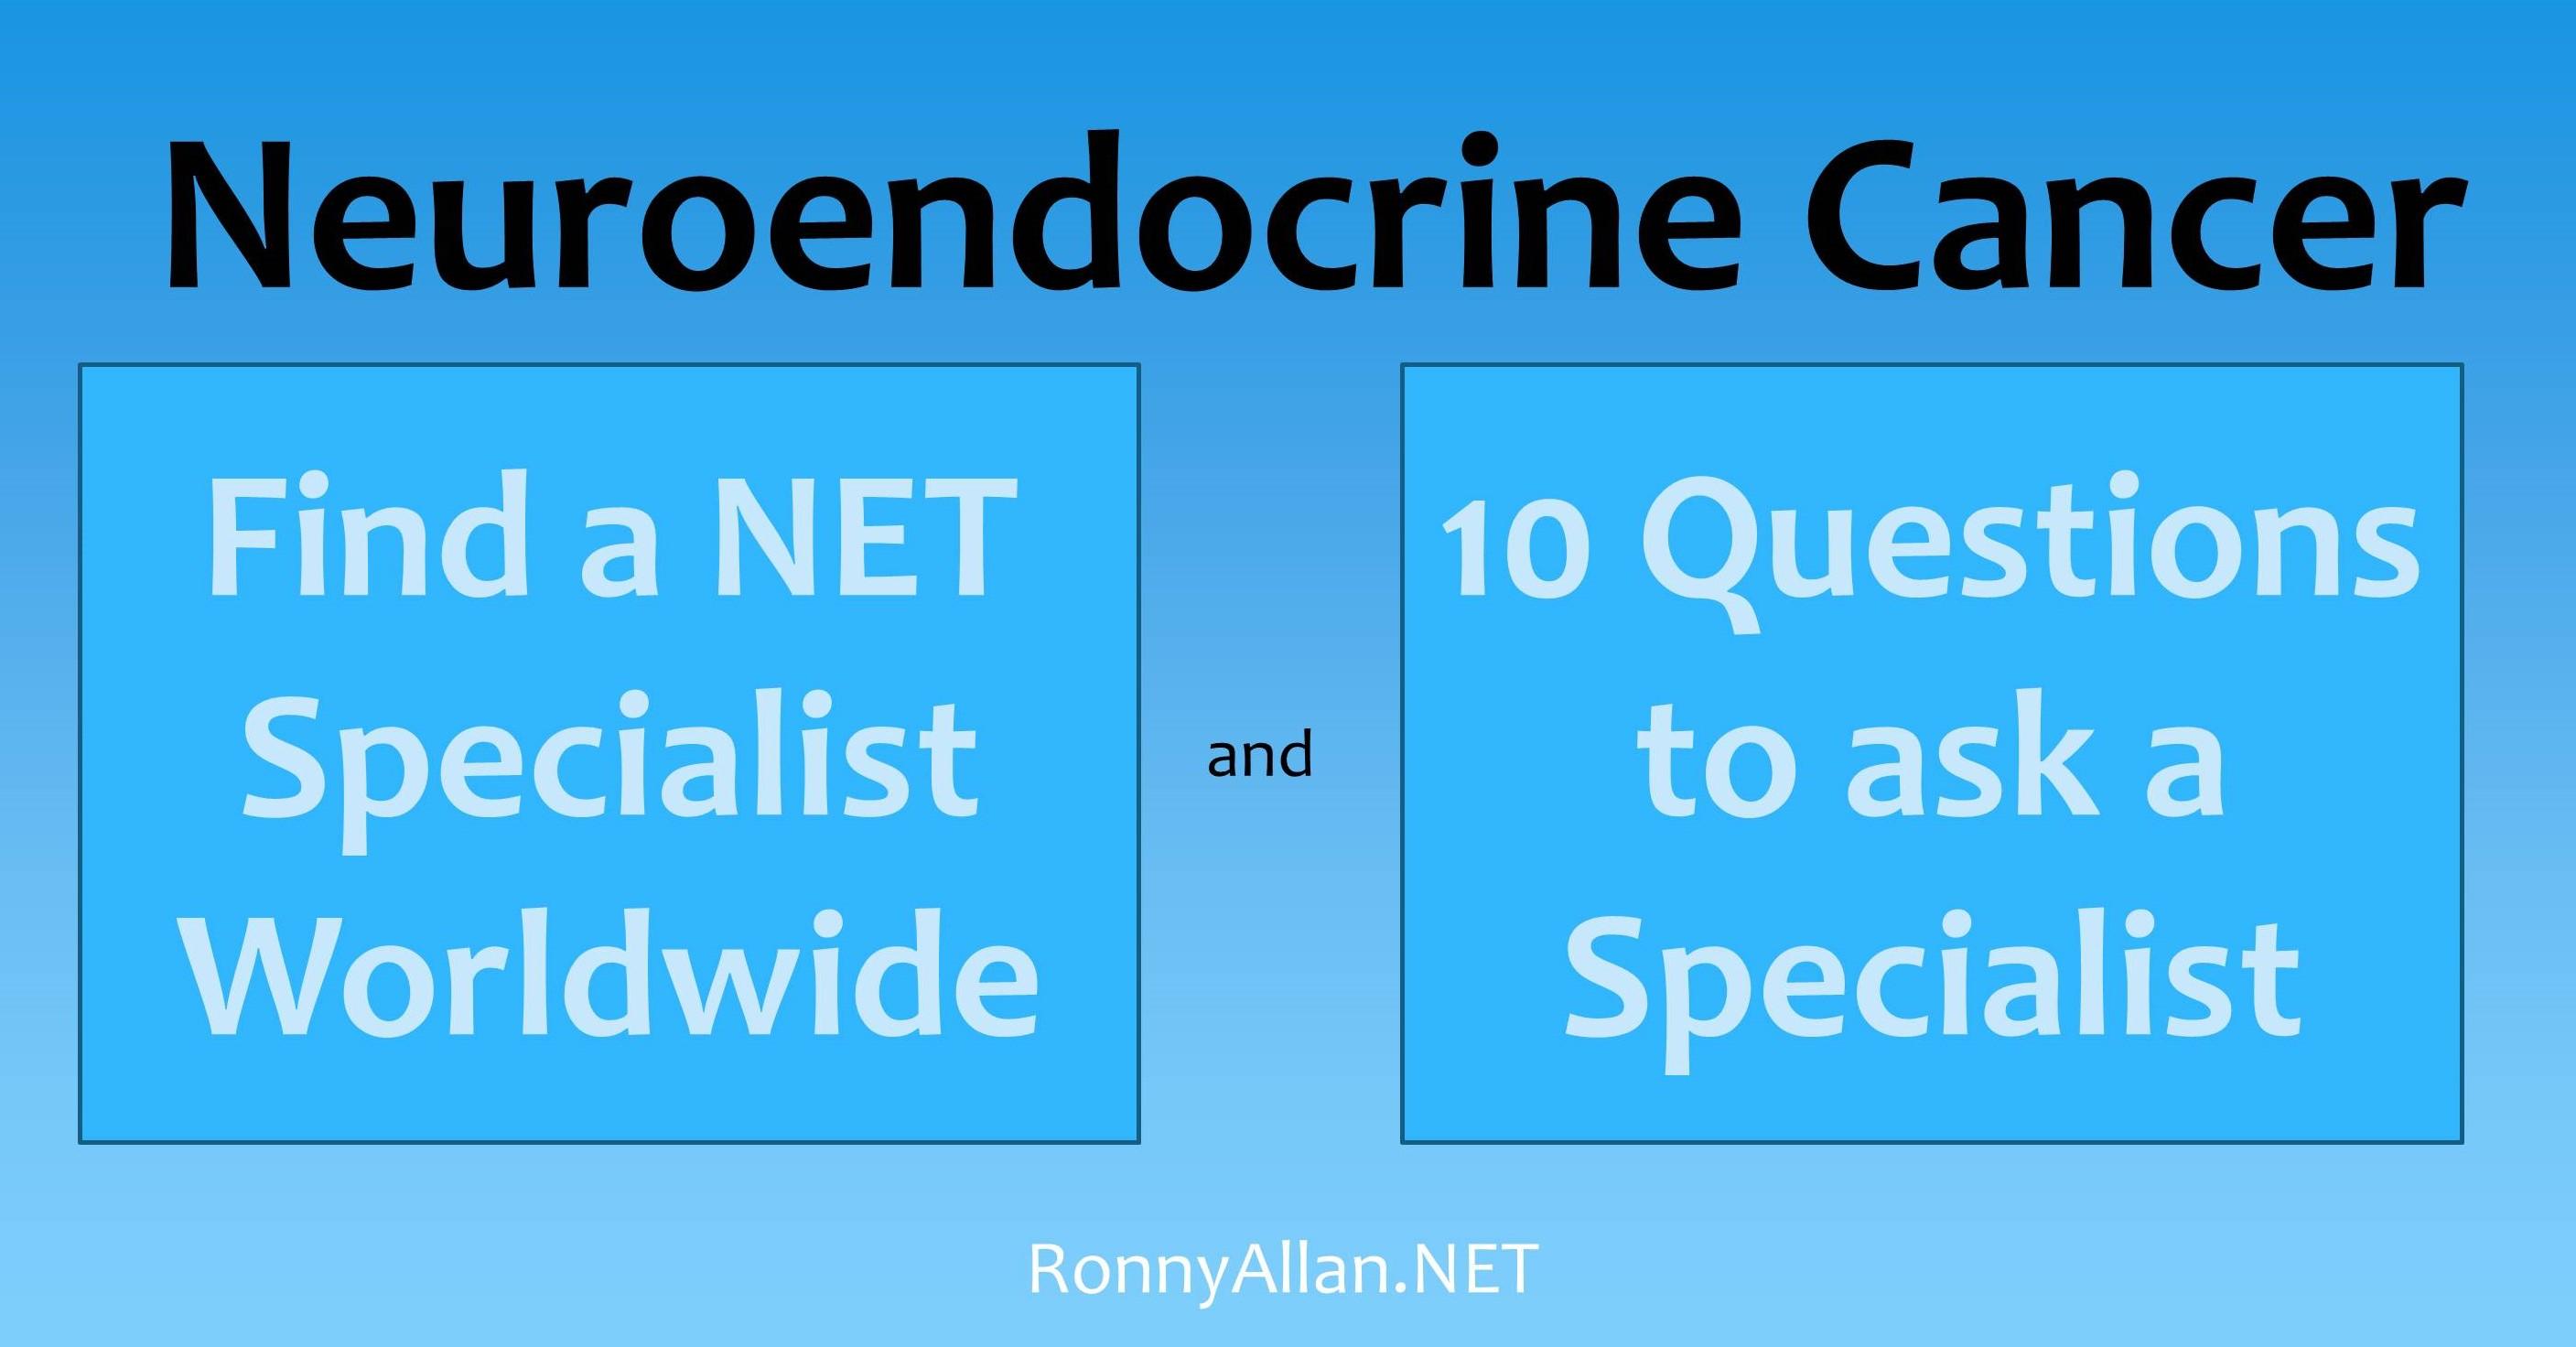 Neuroendocrine cancer best doctors, Neuroendocrine cancer best doctors